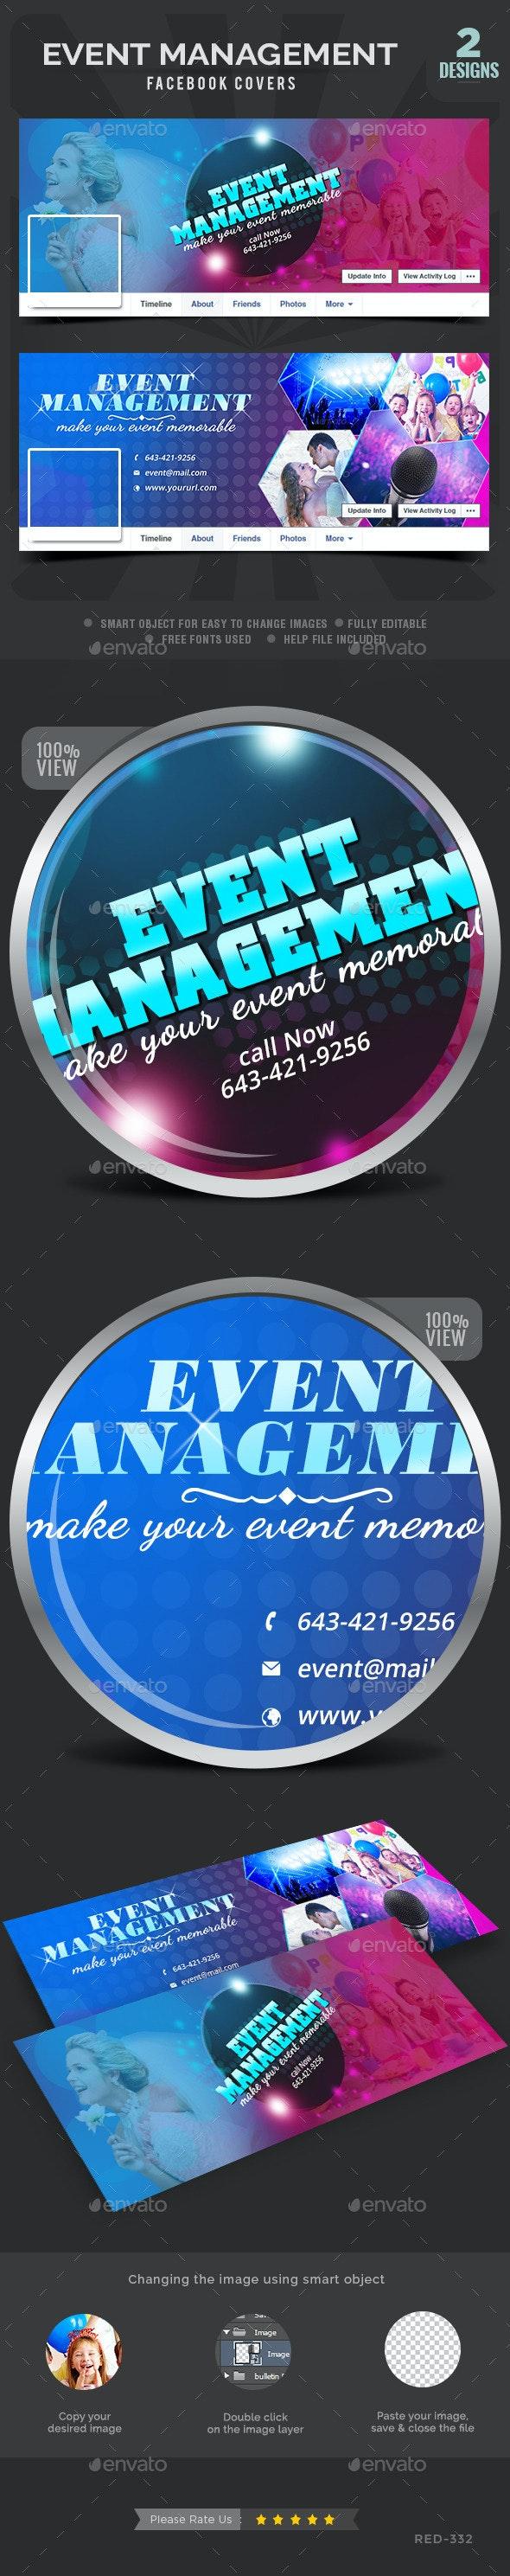 Event Management Facebook Covers - 2 Designs - Facebook Timeline Covers Social Media